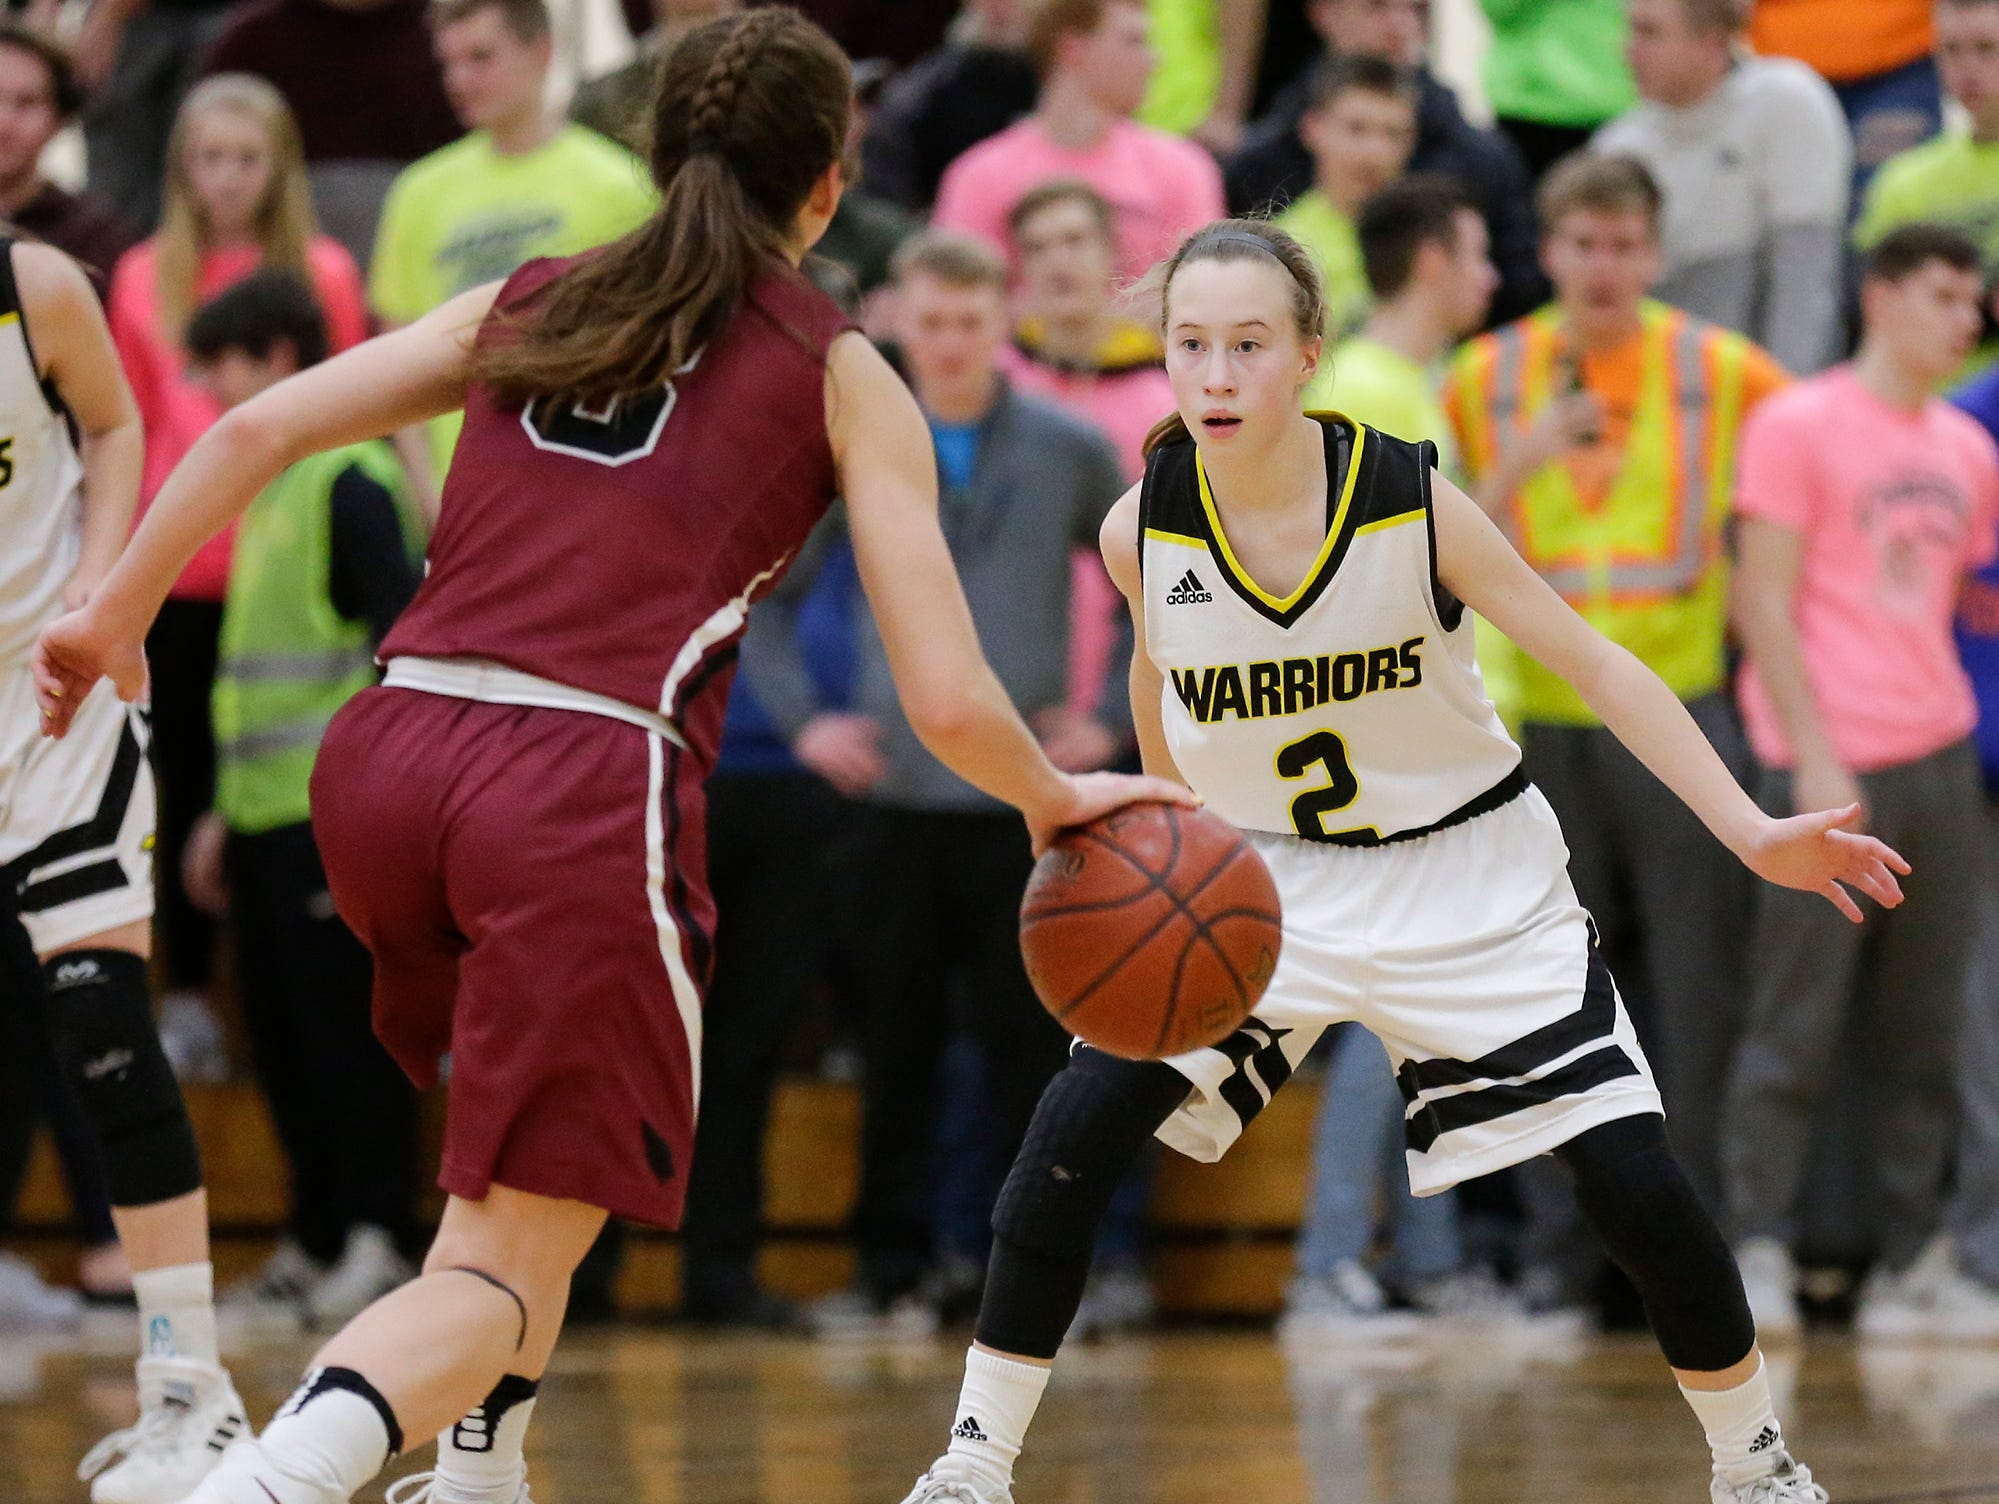 Waupun High School girls basketball's Naomi Aalsma (2) defends Mayville High School's Amber Schraufnagel (3) Saturday, February 23, 2019 during their WIAA Division 4 sectional quarterfinal game in Waupun. Waupun won the game 62-45. Doug Raflik/USA TODAY NETWORK-Wisconsin